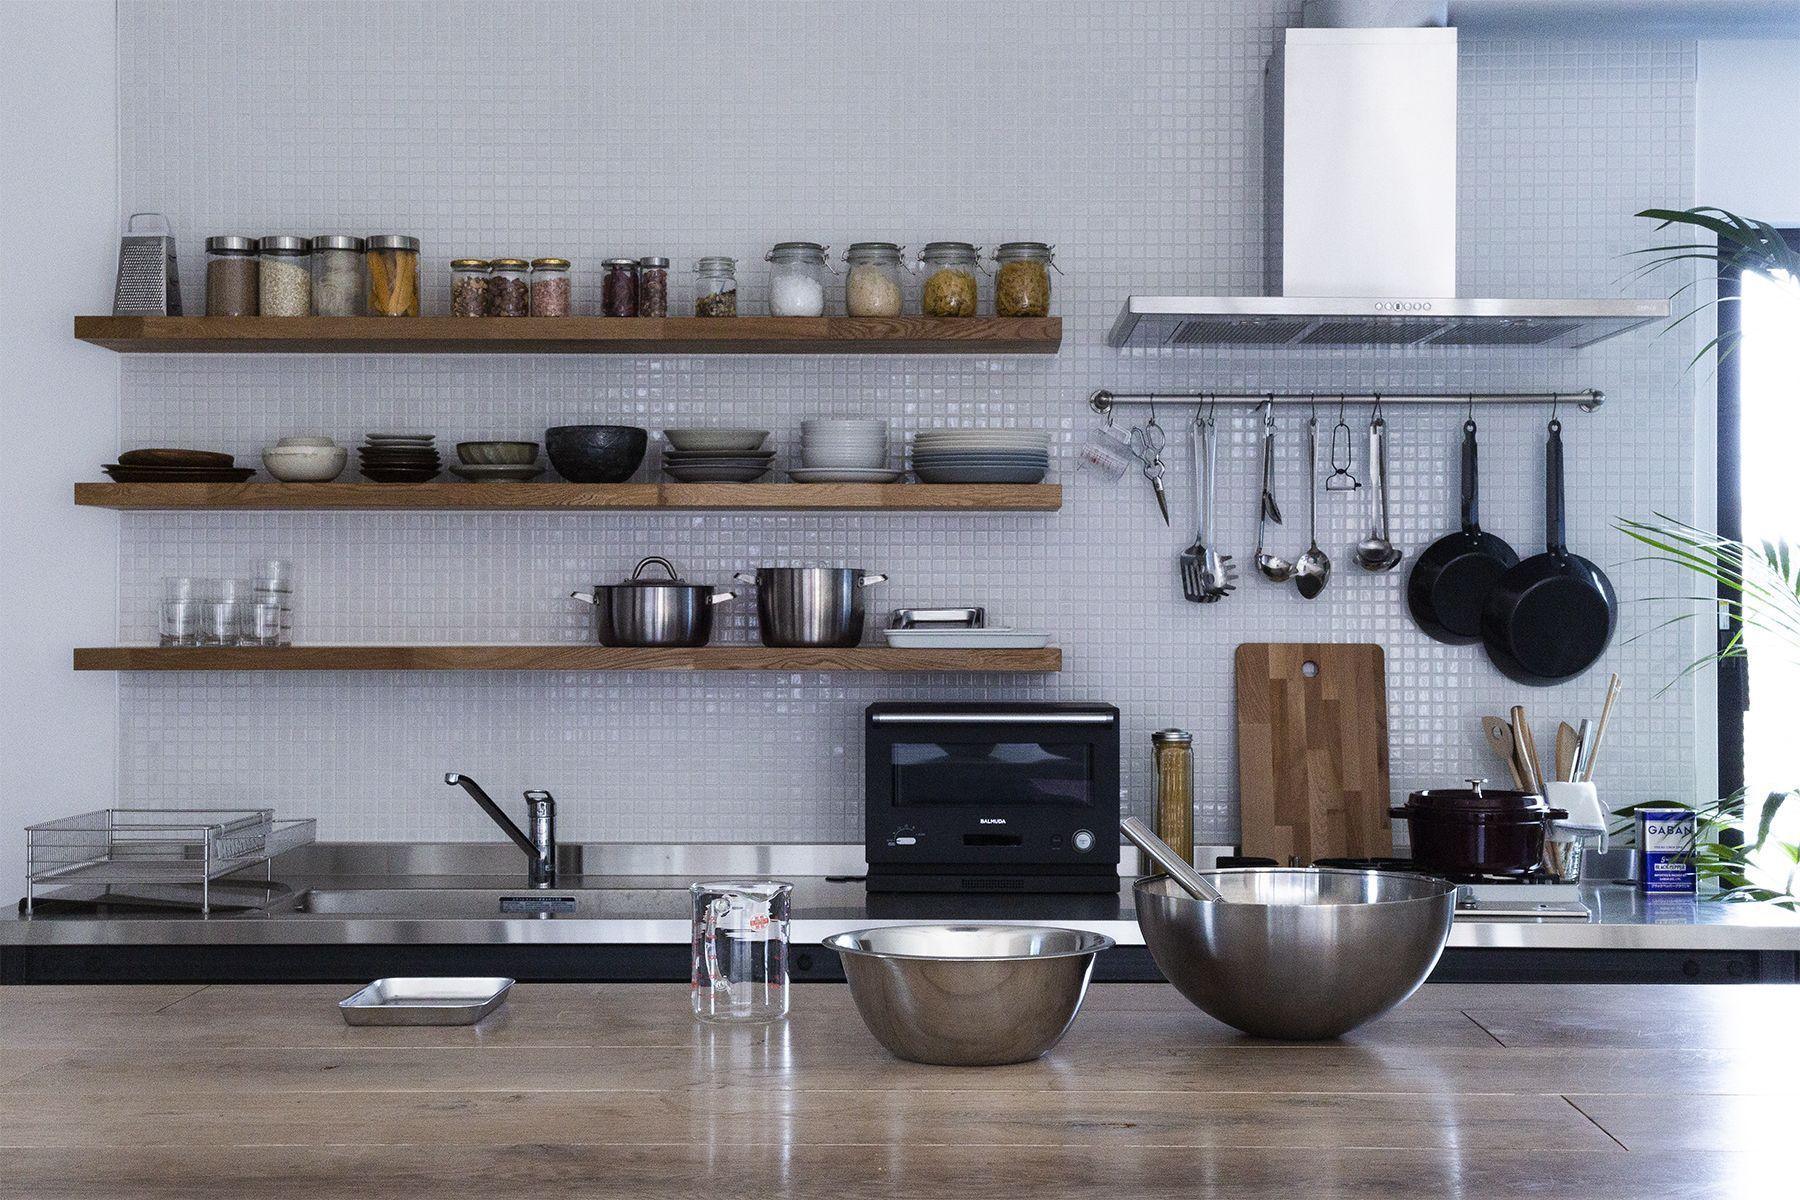 OPRCT Space P (オプレクト)キッチン /大きなダイニングテーブル